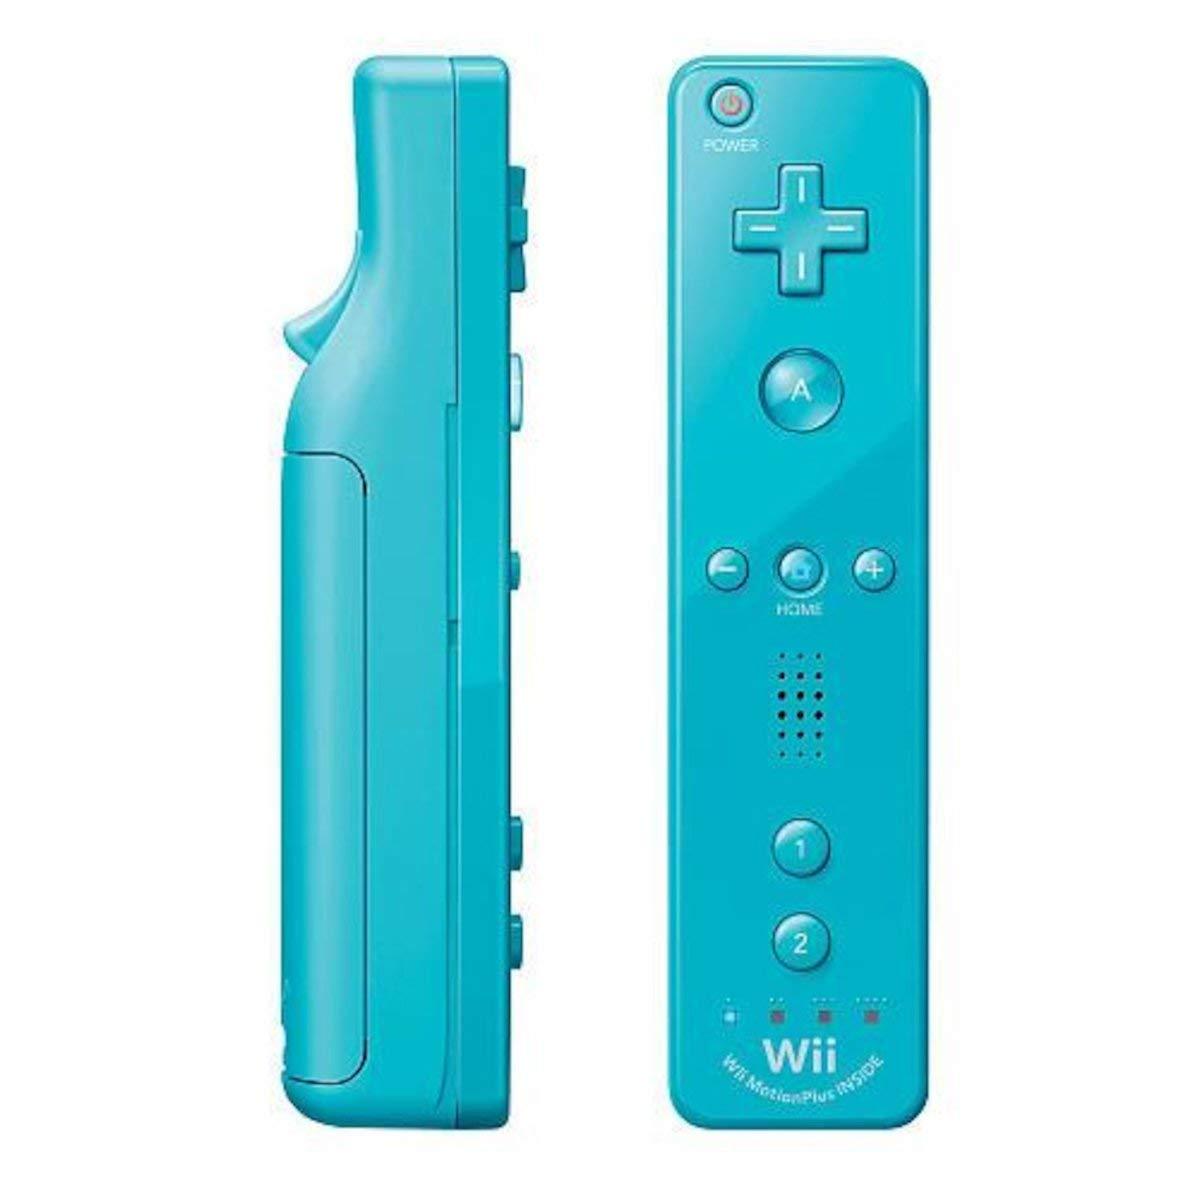 Amazon.com: Nintendo Wii Remote Plus: Video Games